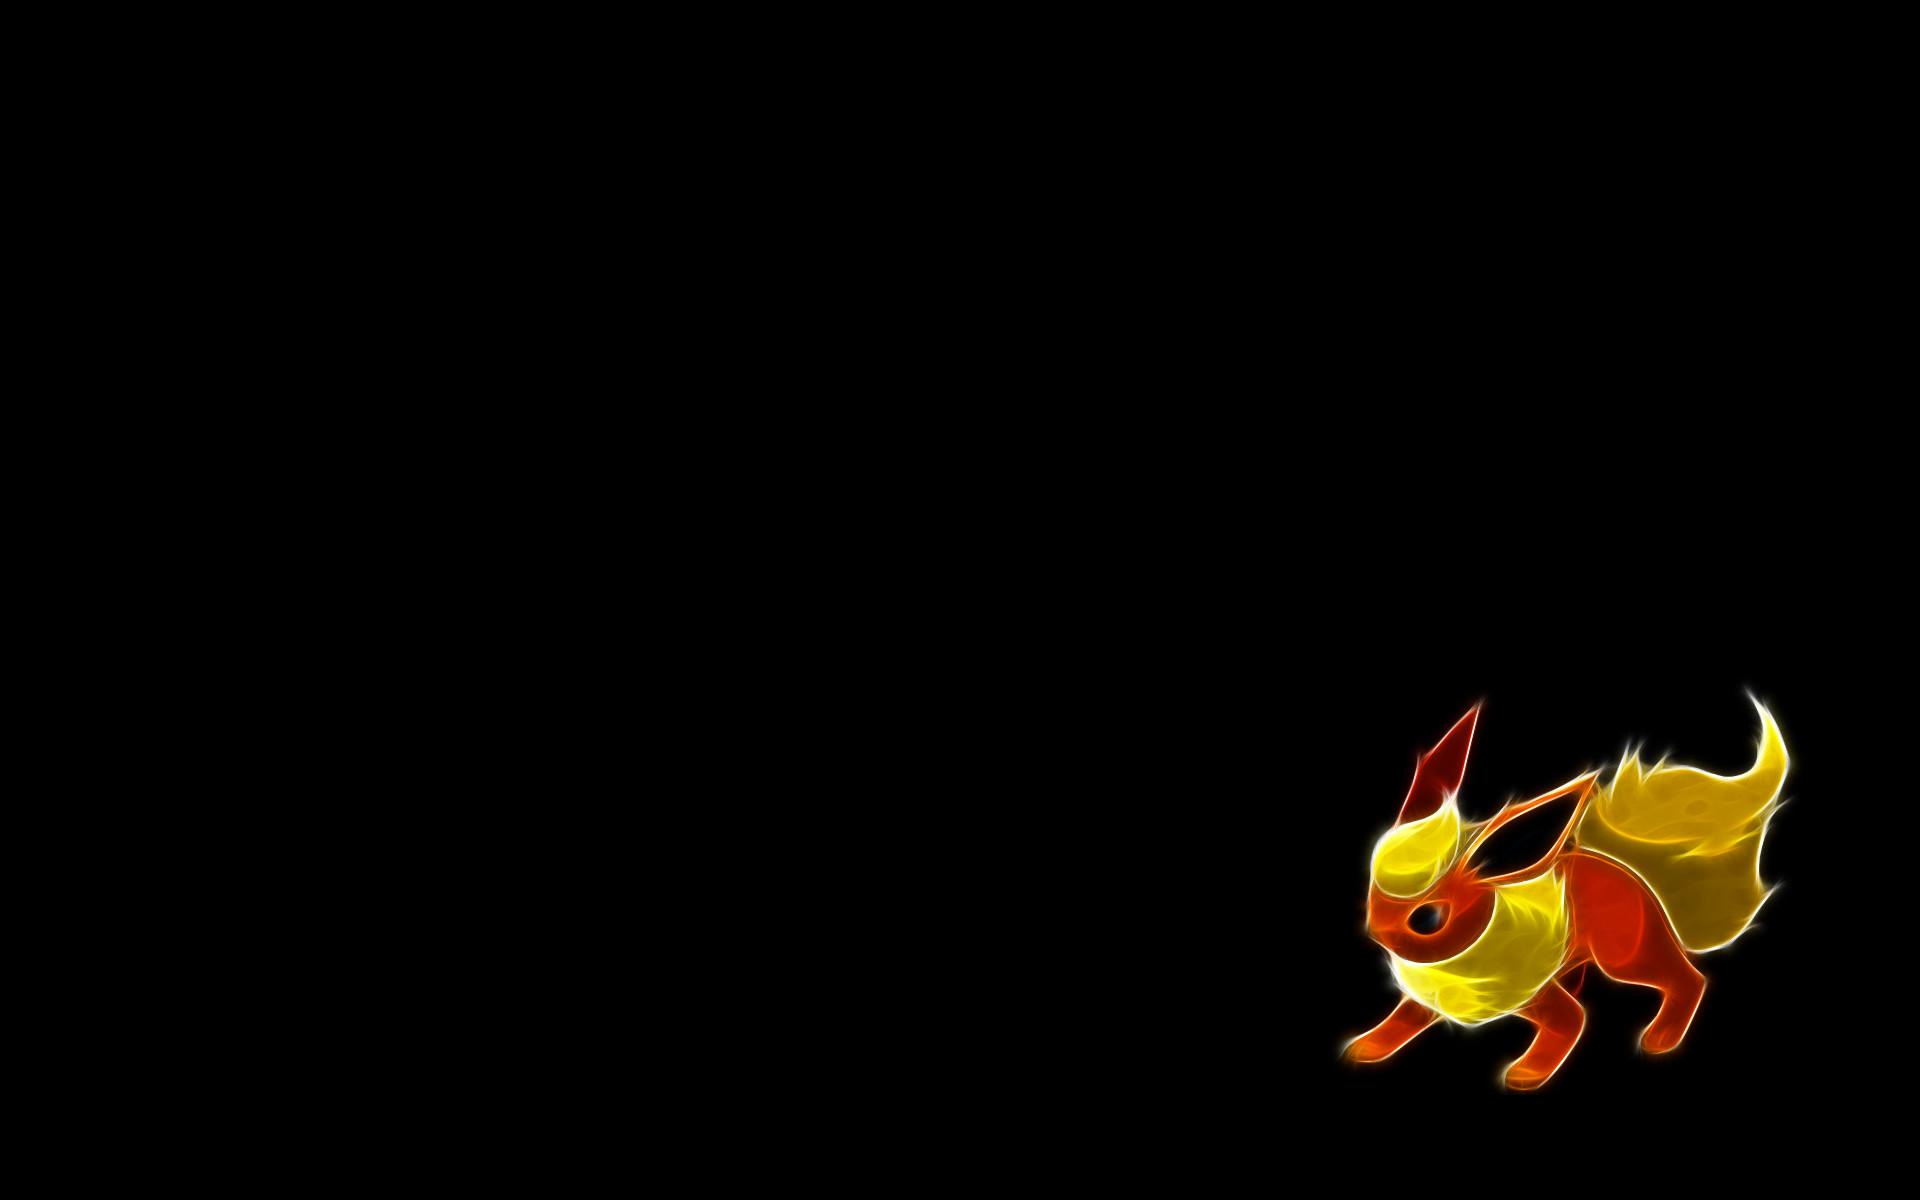 Digimon Black Background wallpaper – 743168